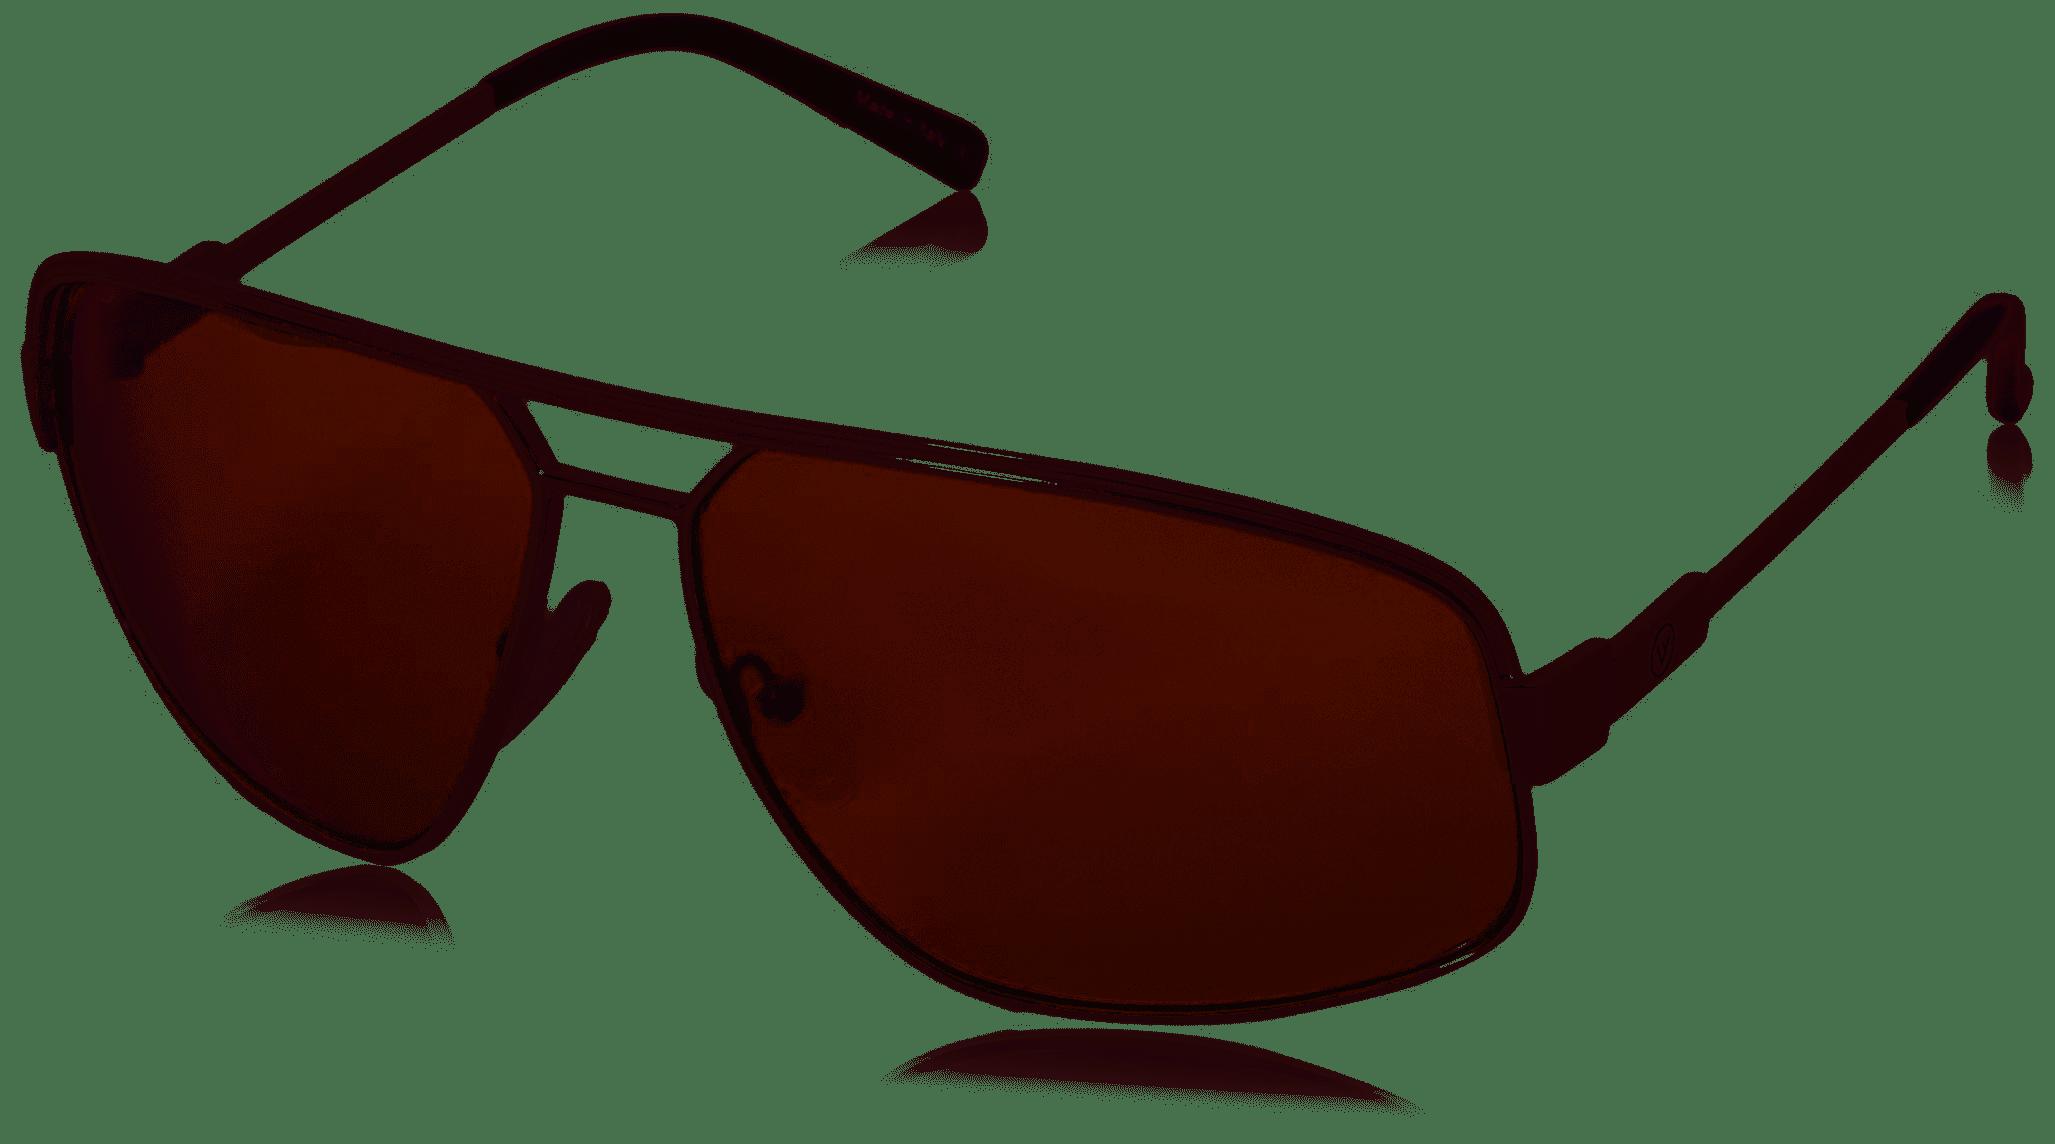 9ace378c87 Revo Unisex Unisex RB 1002 Bono Collection Stargazer Aviator Polarized  Sunglasses 78% OFF  54.99